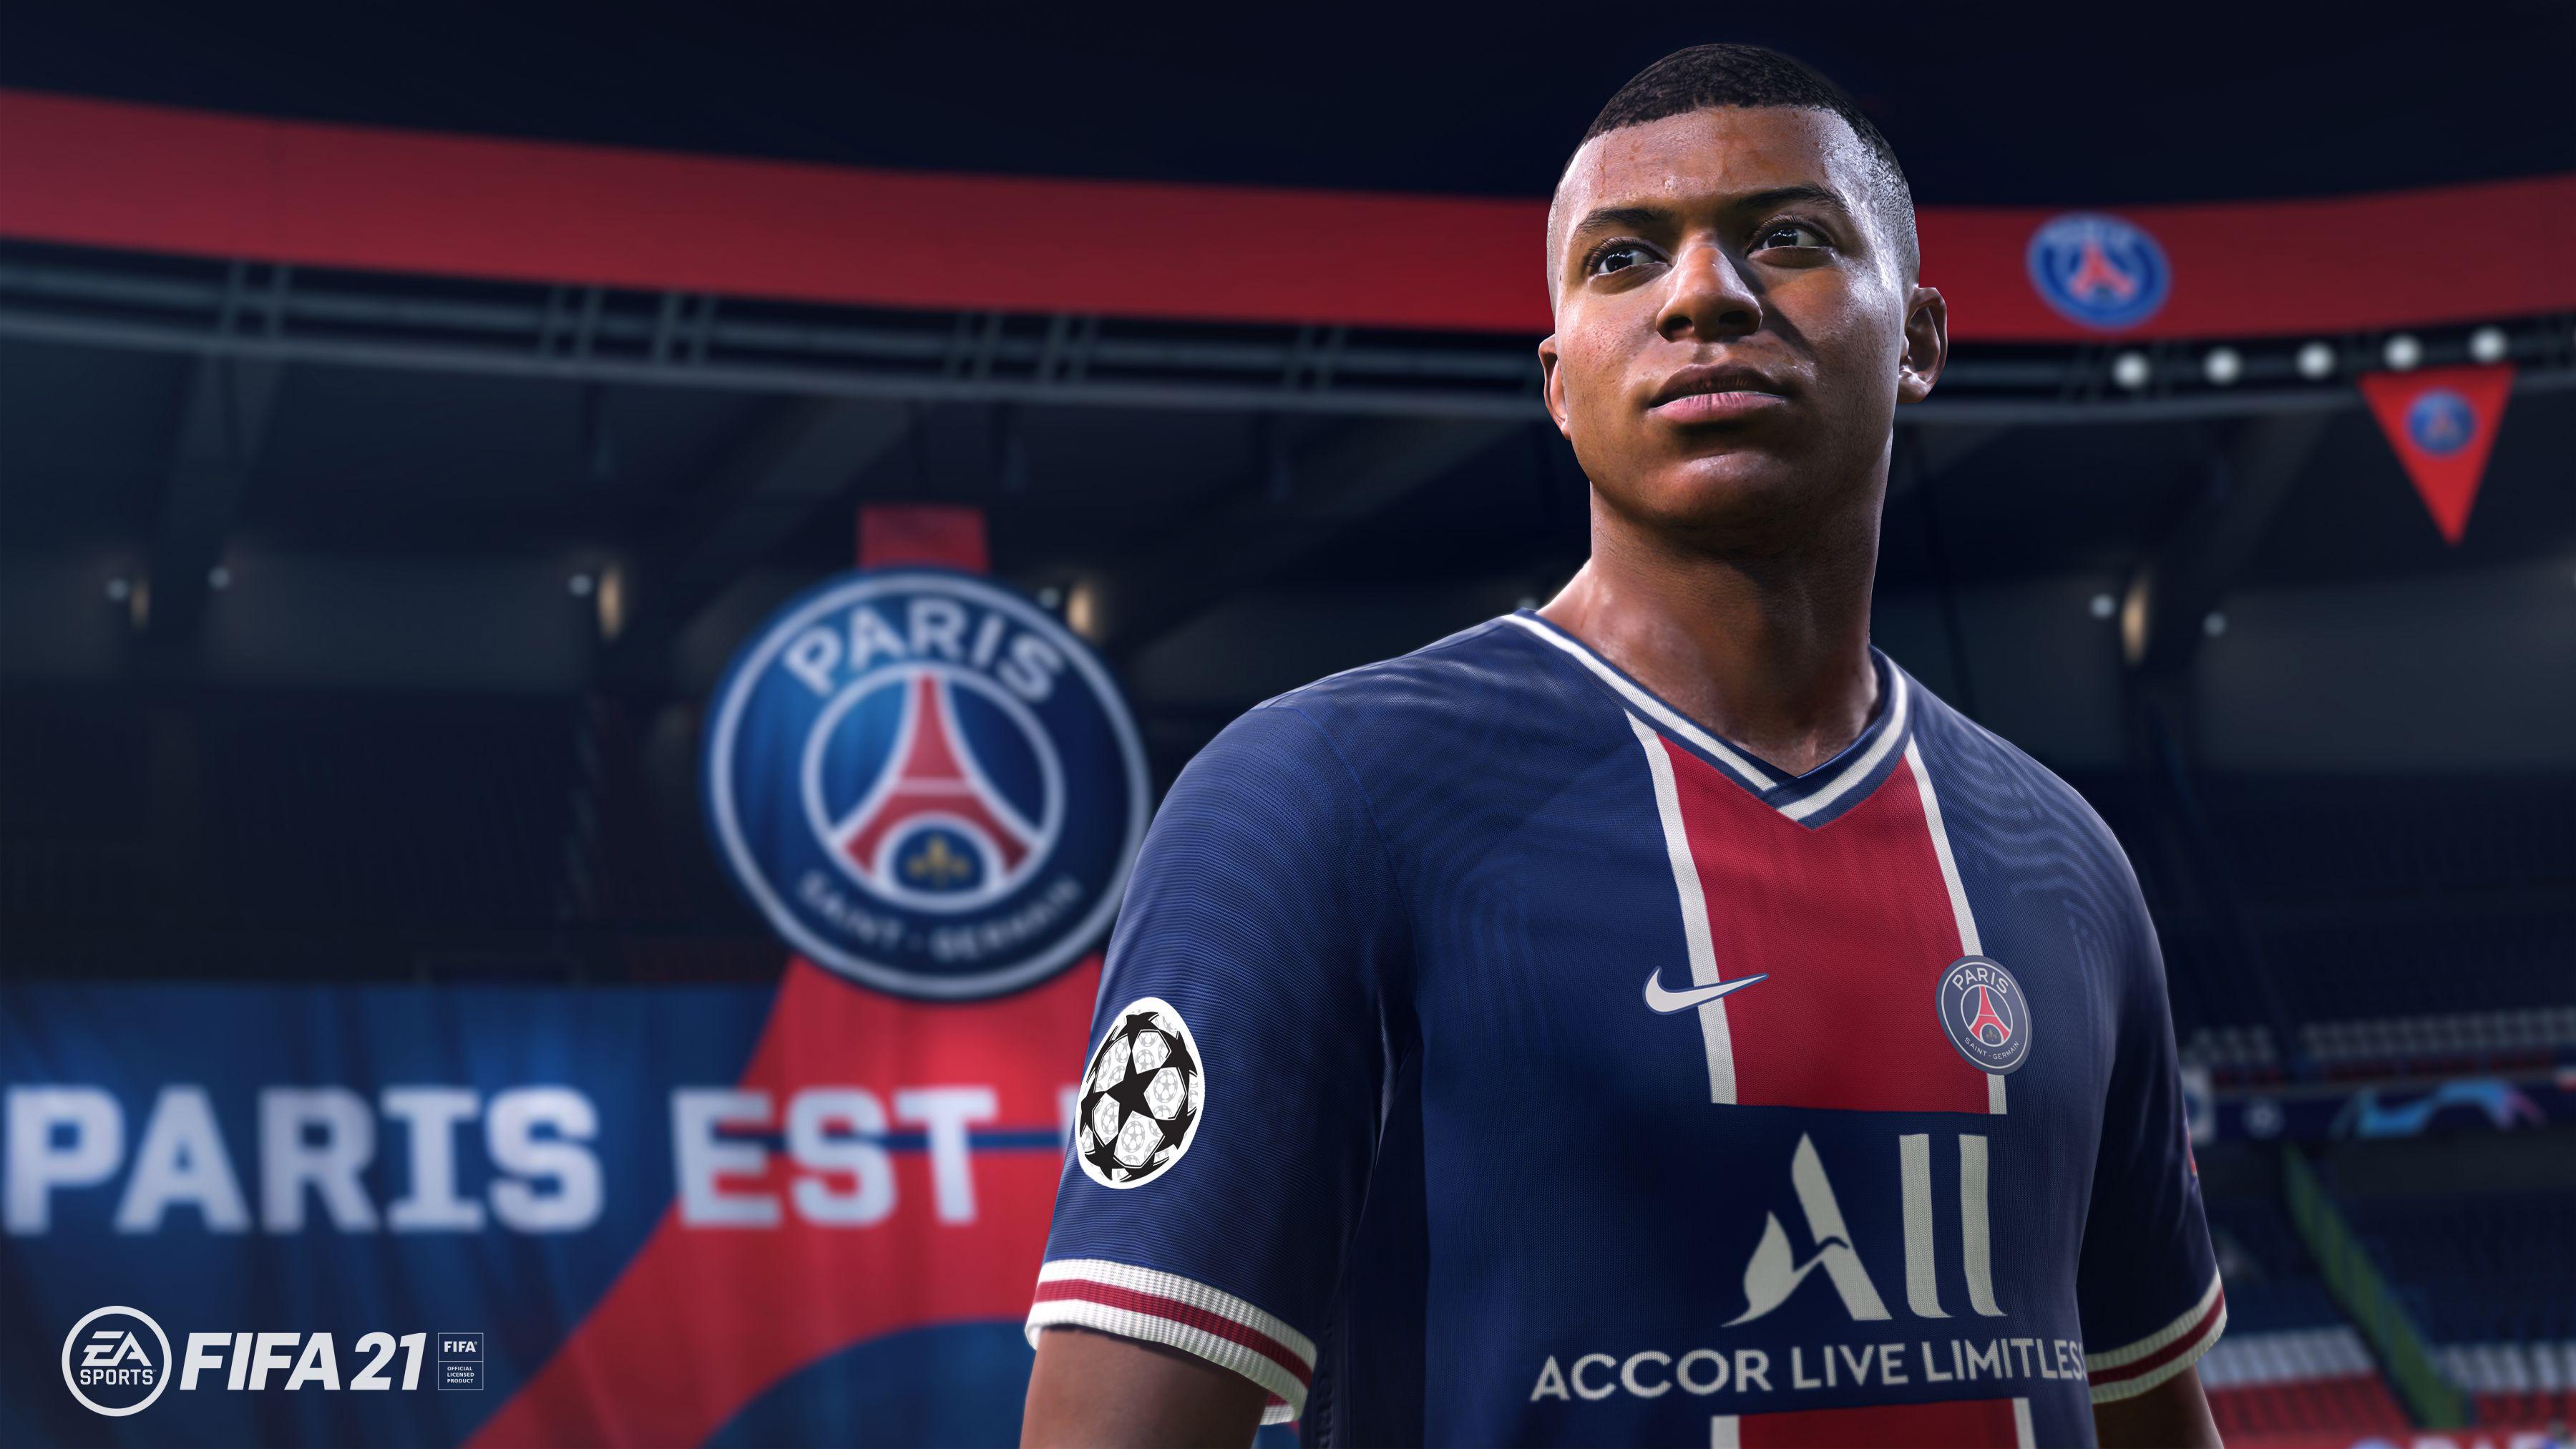 EA SPORTS FIFA 21 se lansează global astăzi